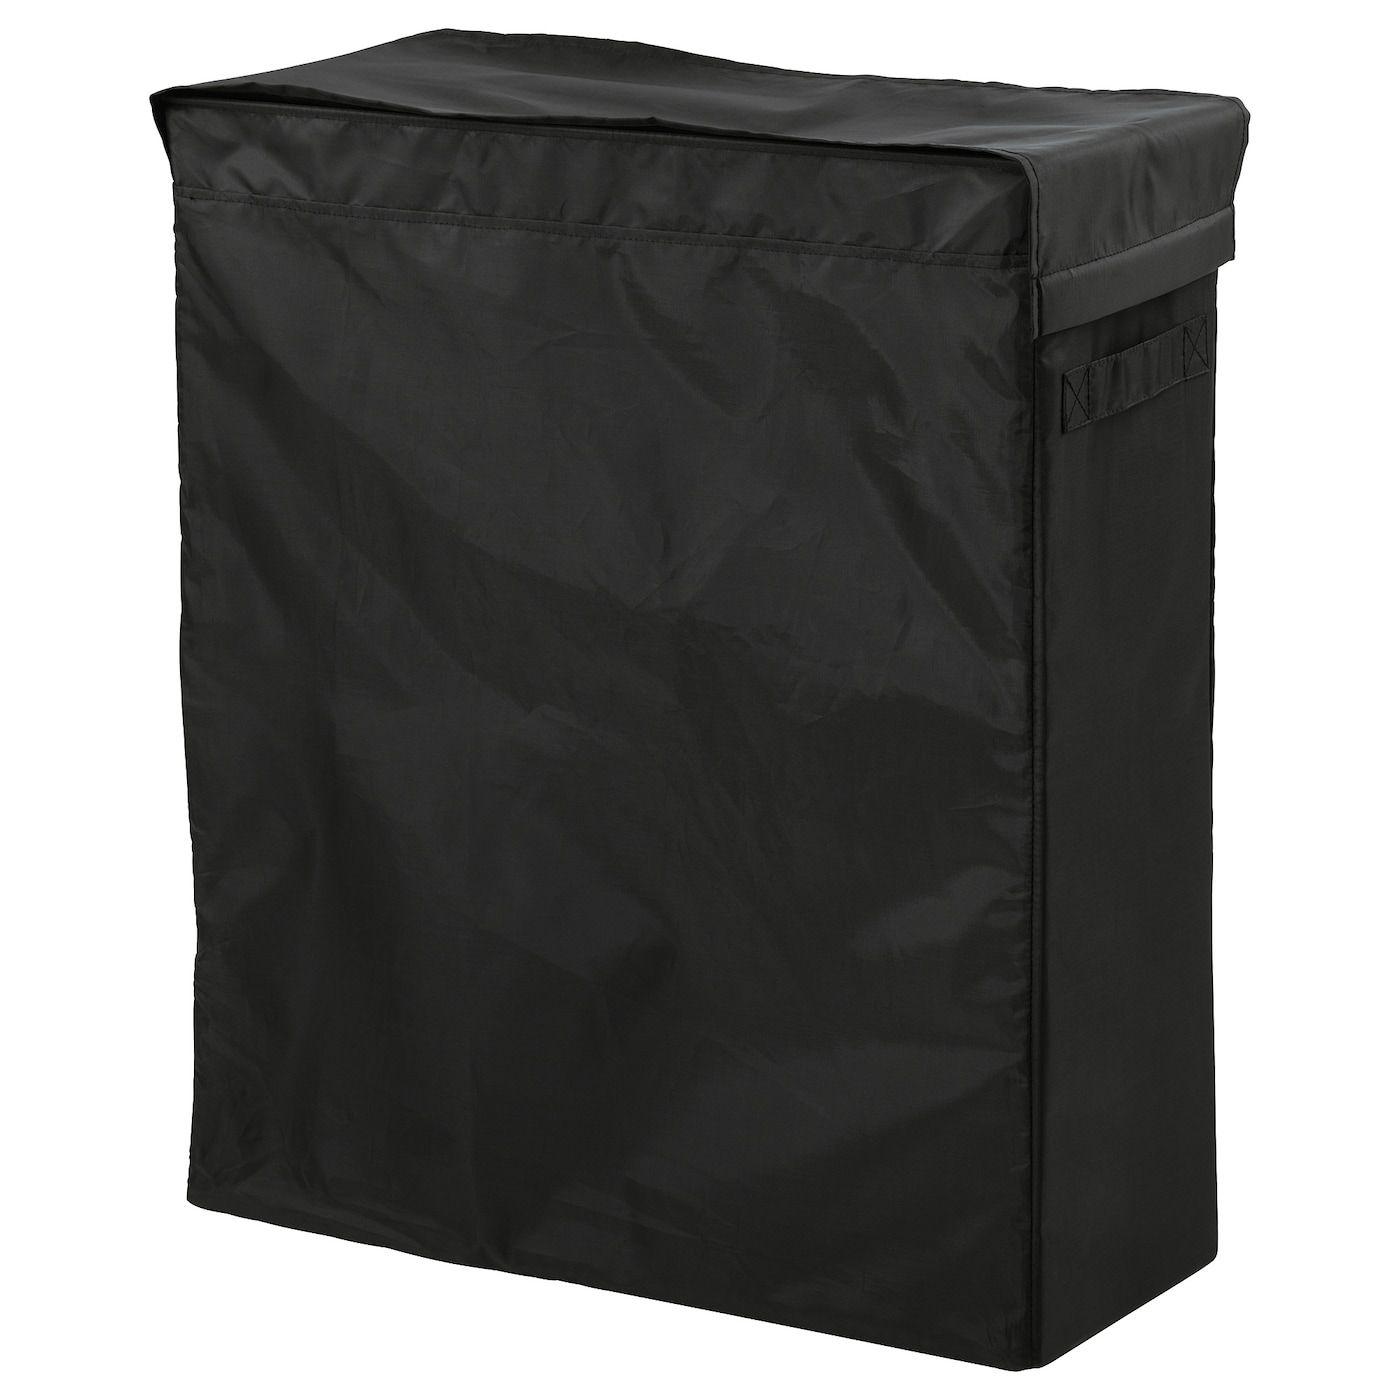 Ikea Skubb Laundry Bag With Stand Black Ikea Laundry Ikea